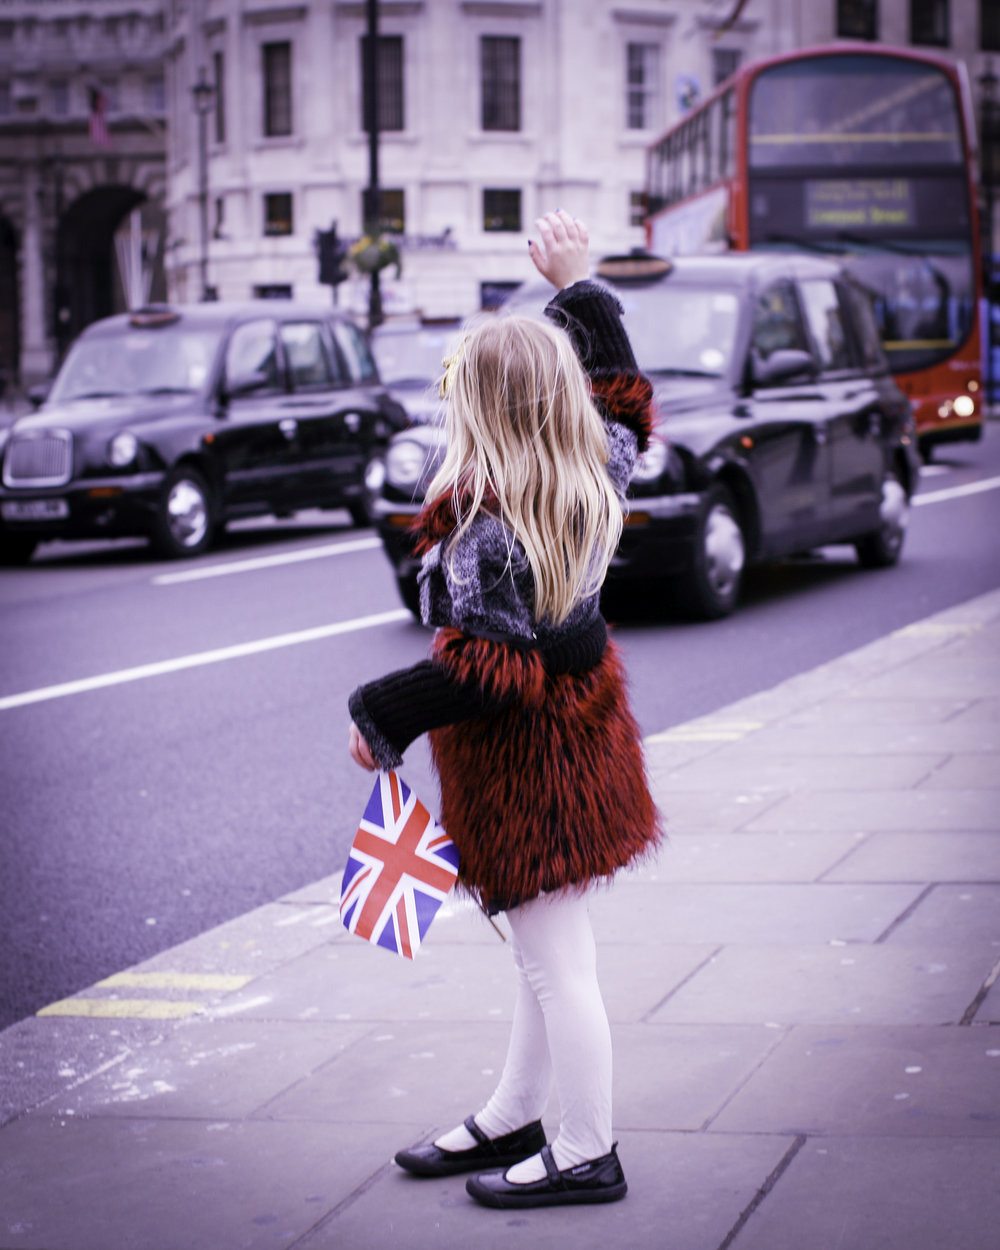 _MG_9929_bianca london_ritathompson.jpg